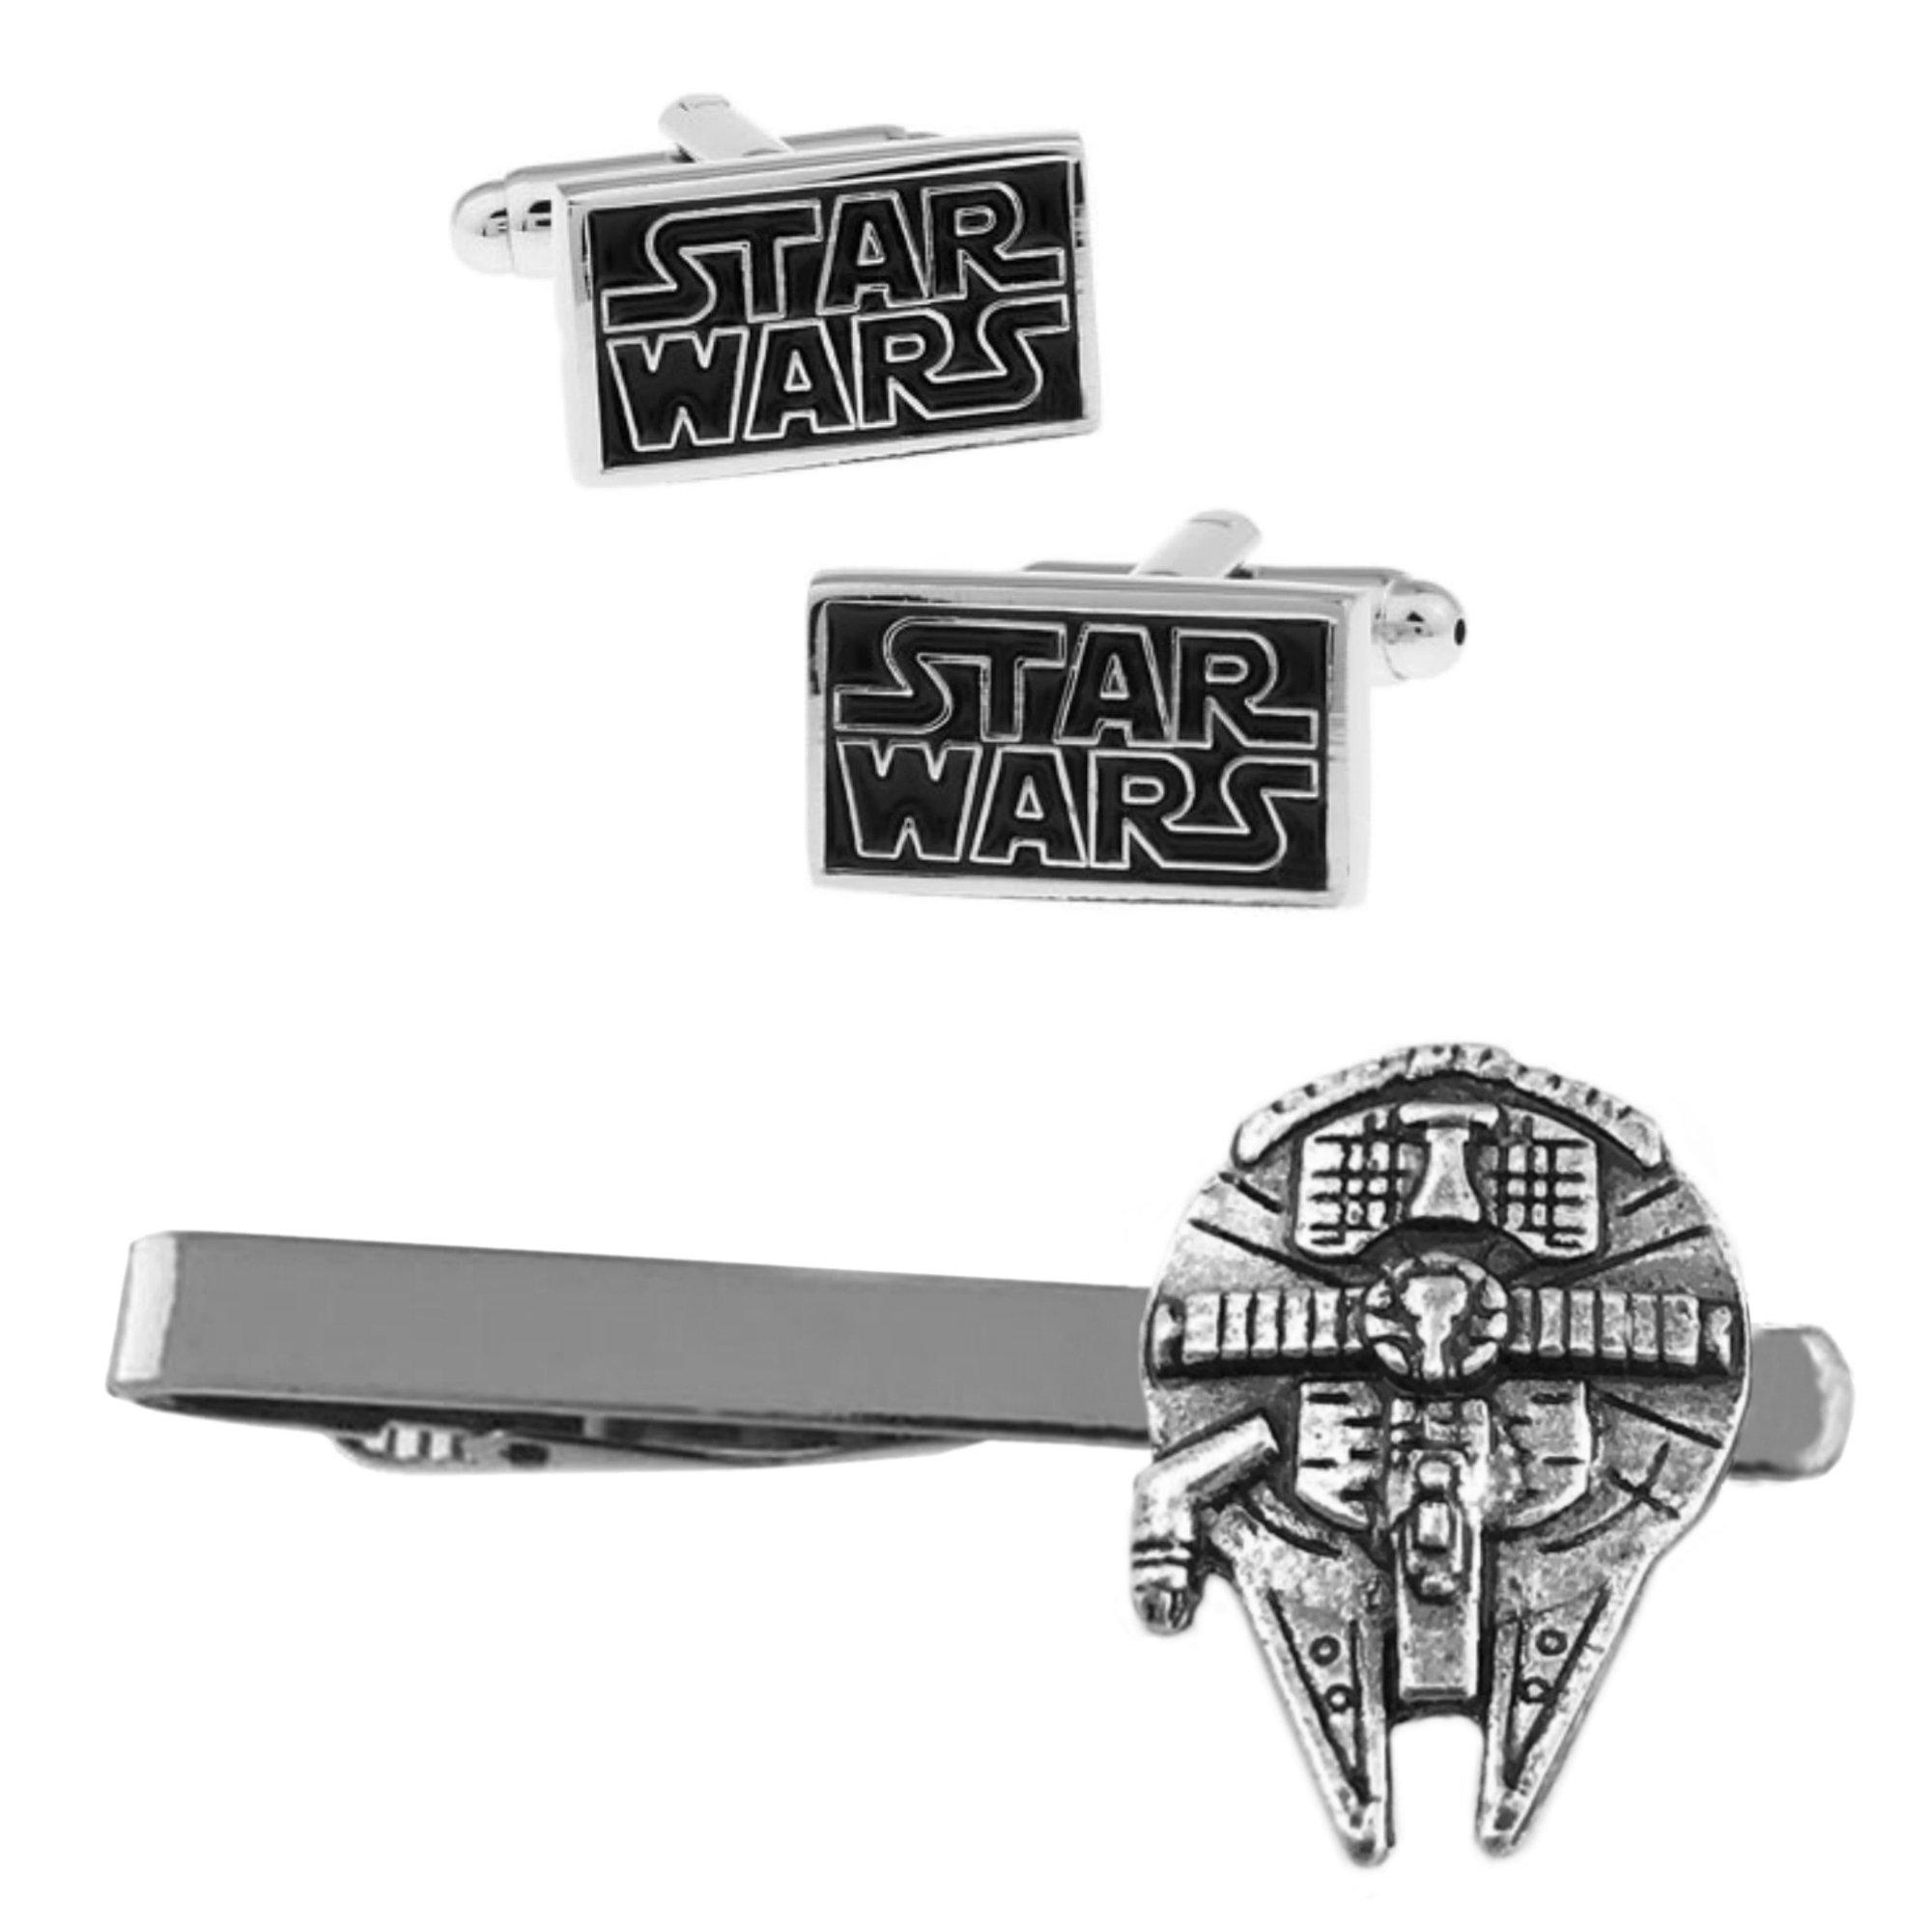 Outlander Star Wars Text Cufflink & Millenium Falcon Tiebar - New 2018 Star Wars Movies - Set of 2 Wedding Logo w/Gift Box